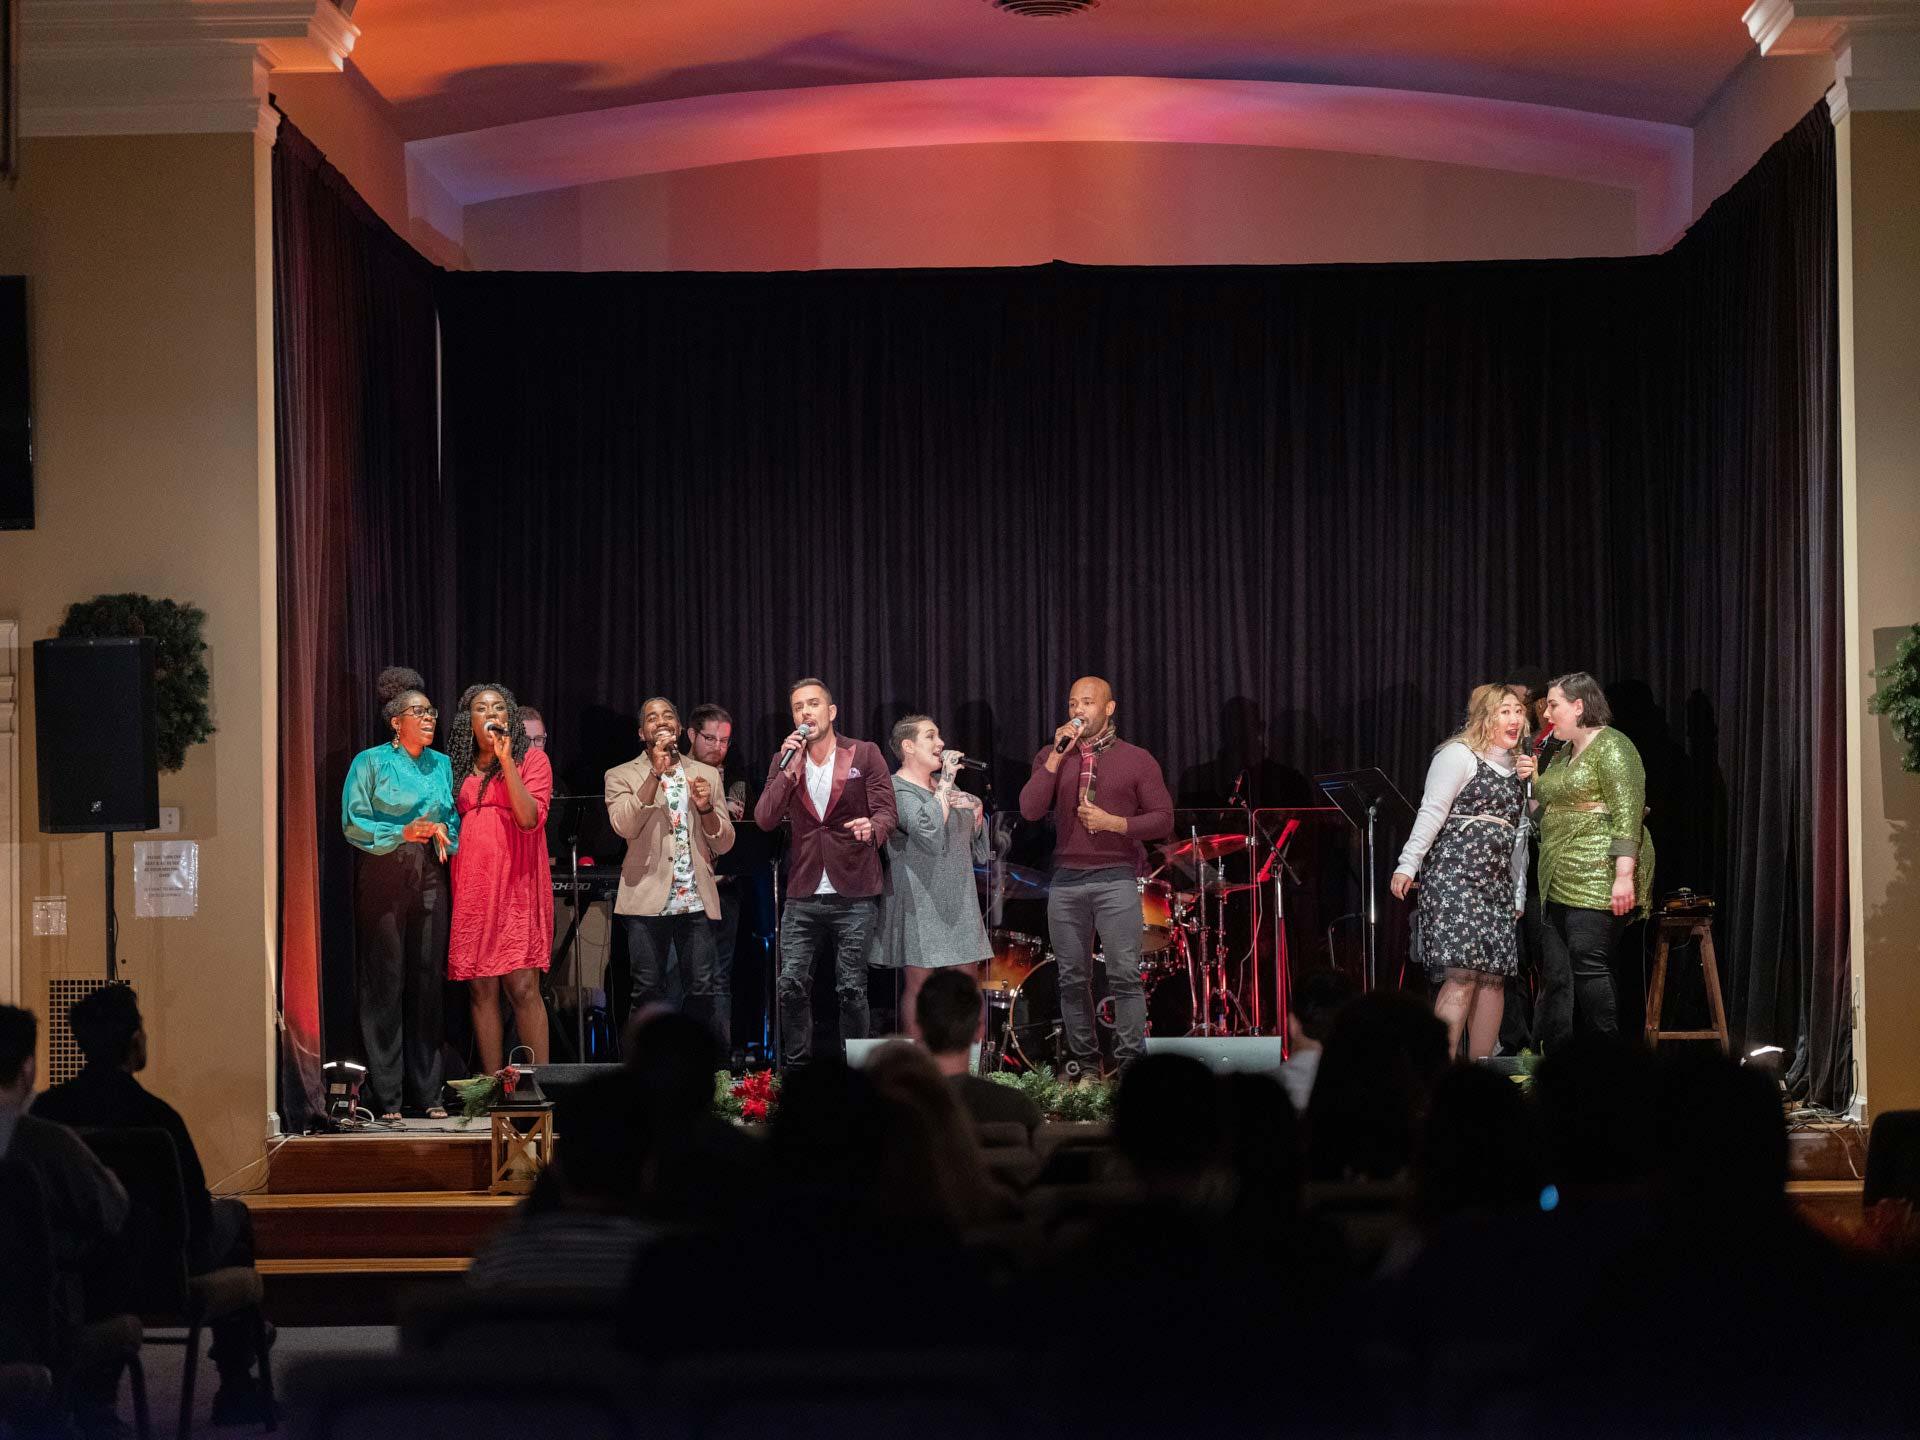 sharing-the-joy-of-the-season-harmony-christmas-benefit-concert-9